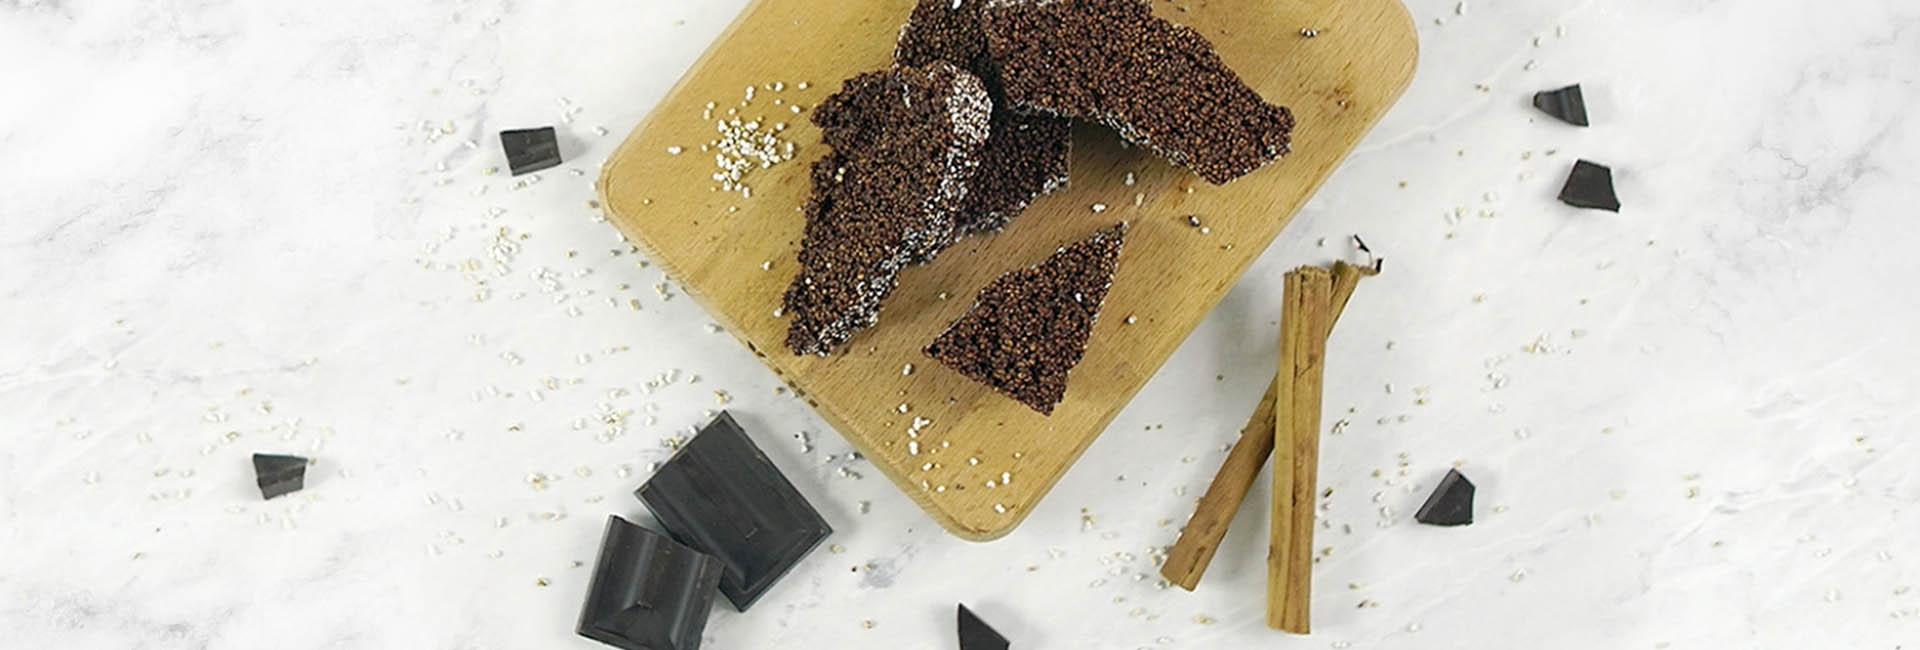 Chocolate crujiente sin azúcar